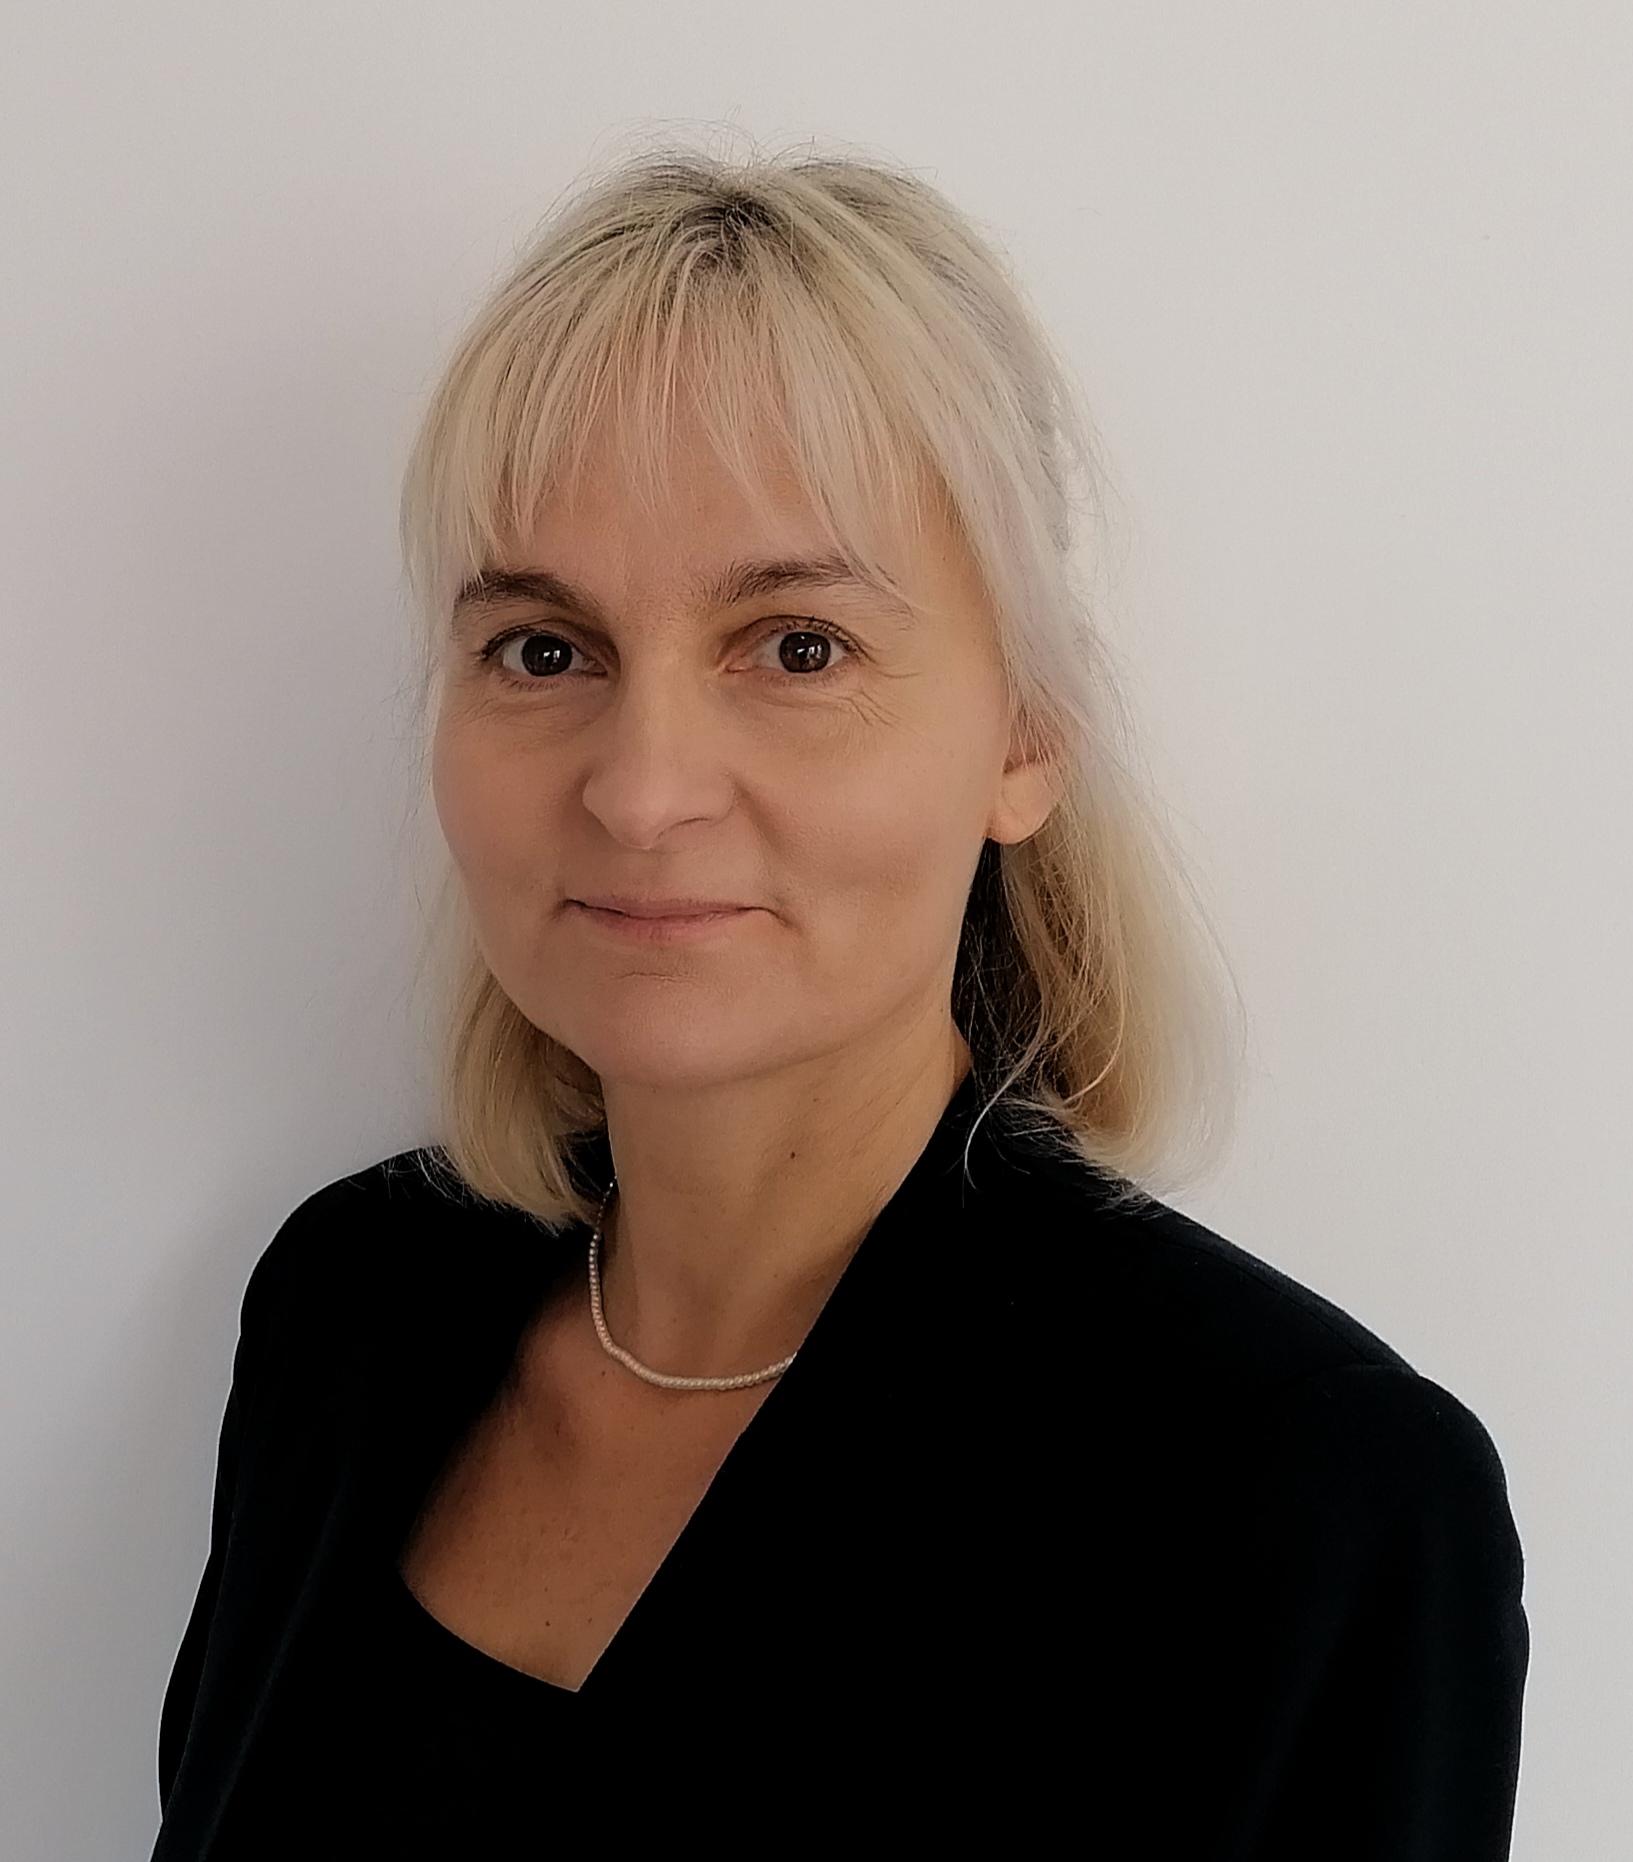 Dr. Ildikó Horváth